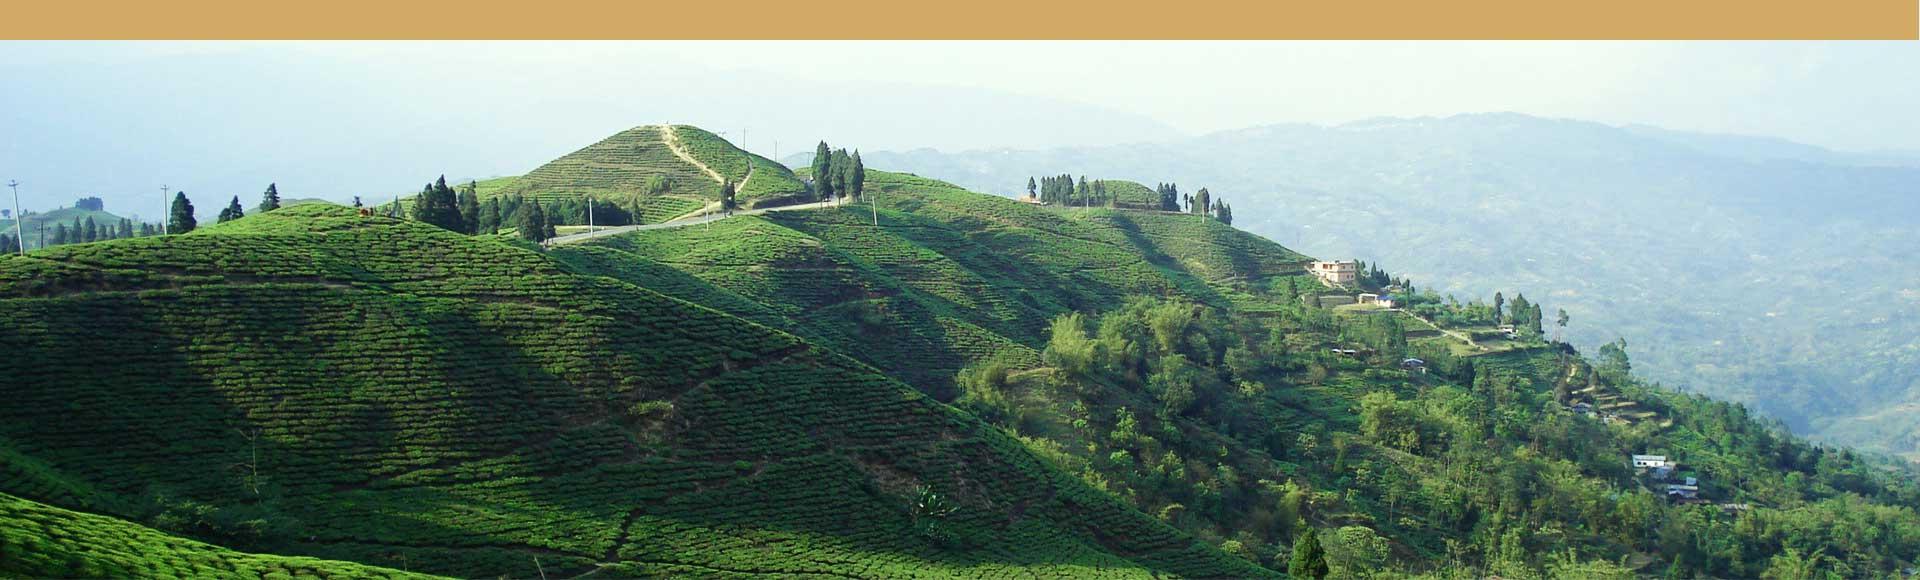 Nepal jardines de te, Himalayan Black